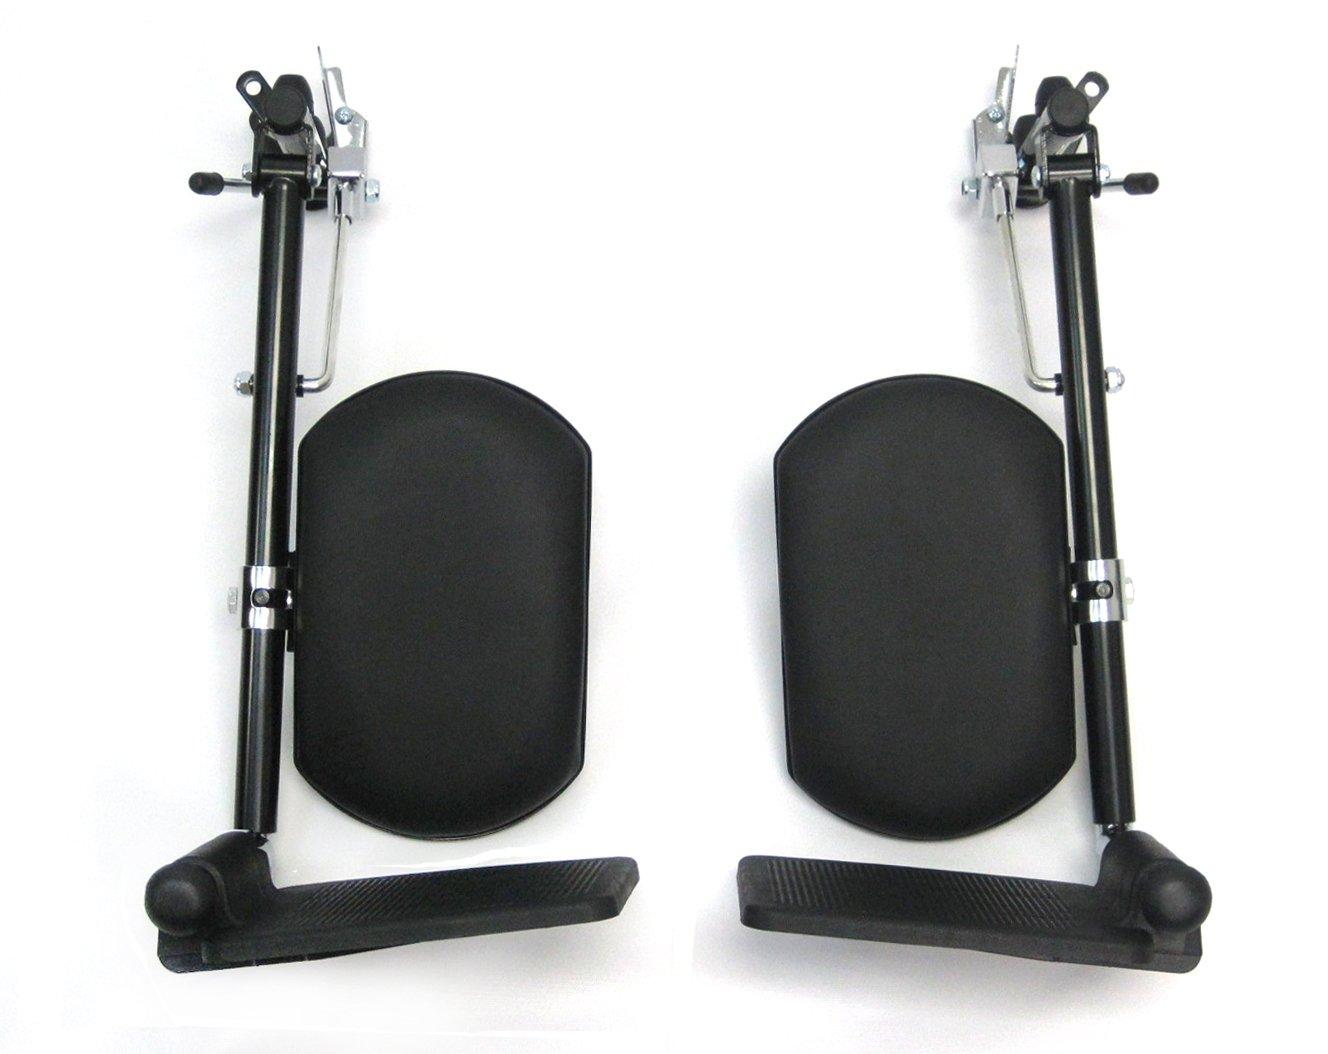 Karman Universal Elevating Legrest for Wheelchair, Black, INV Style by Karman